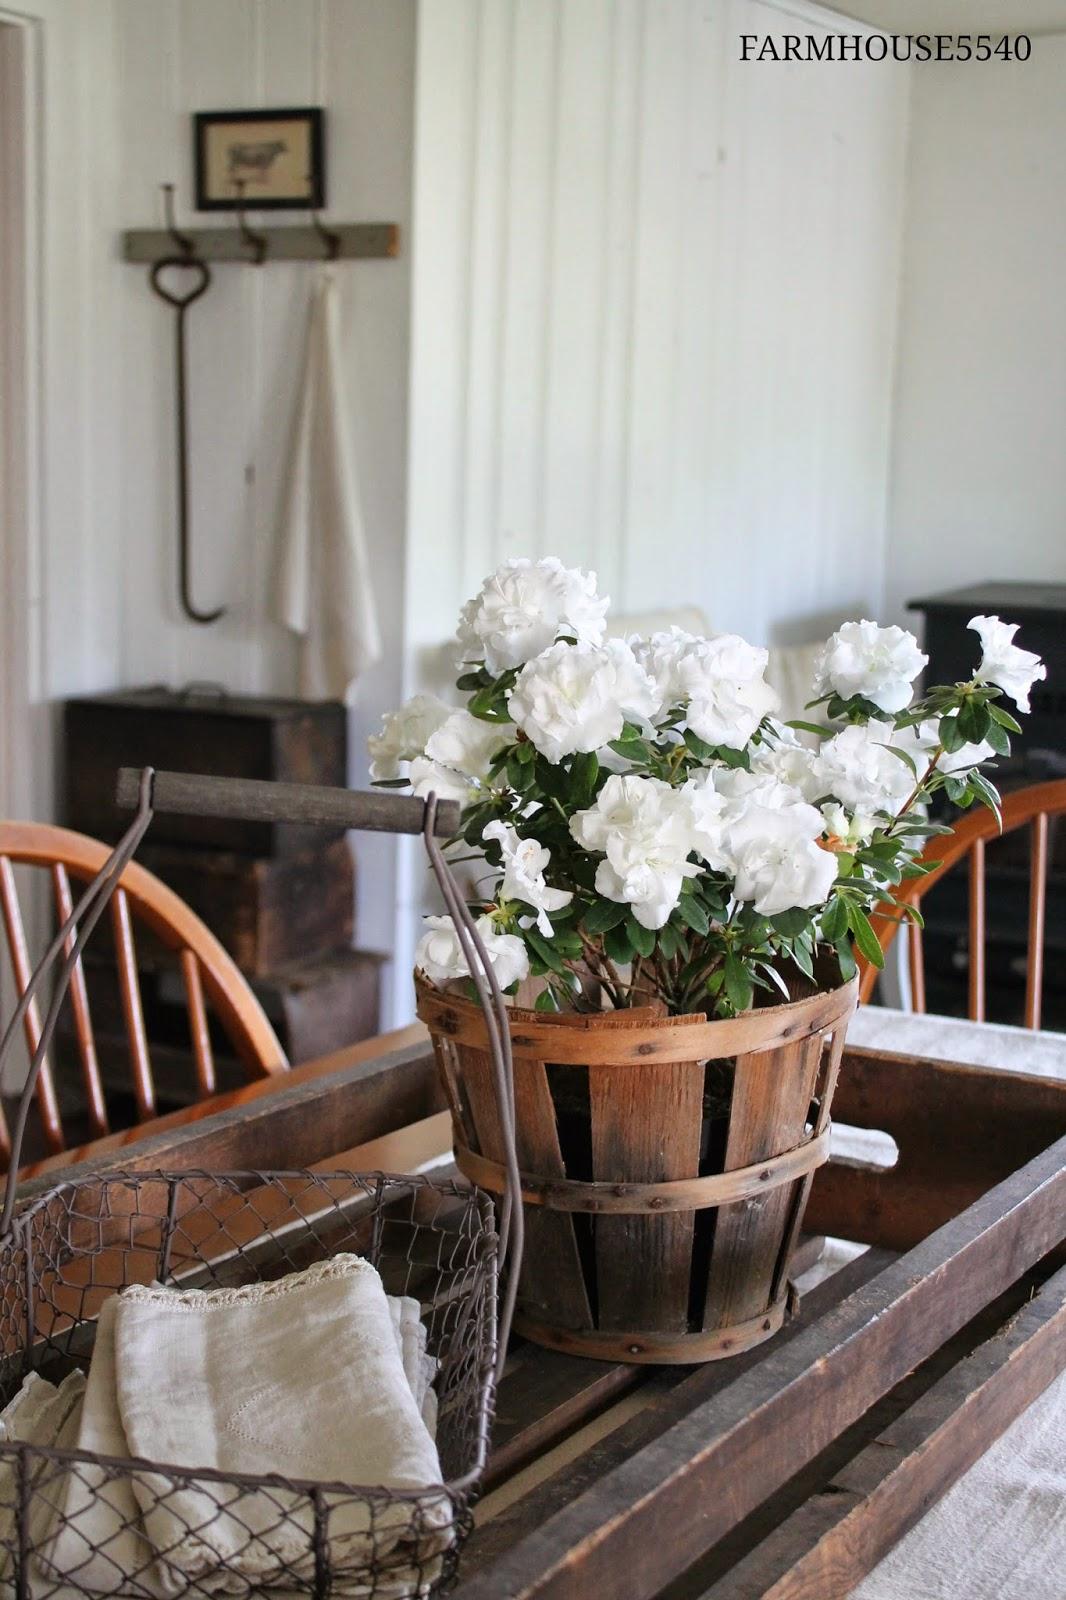 FARMHOUSE 5540: Dining Room On A Sunny Morning